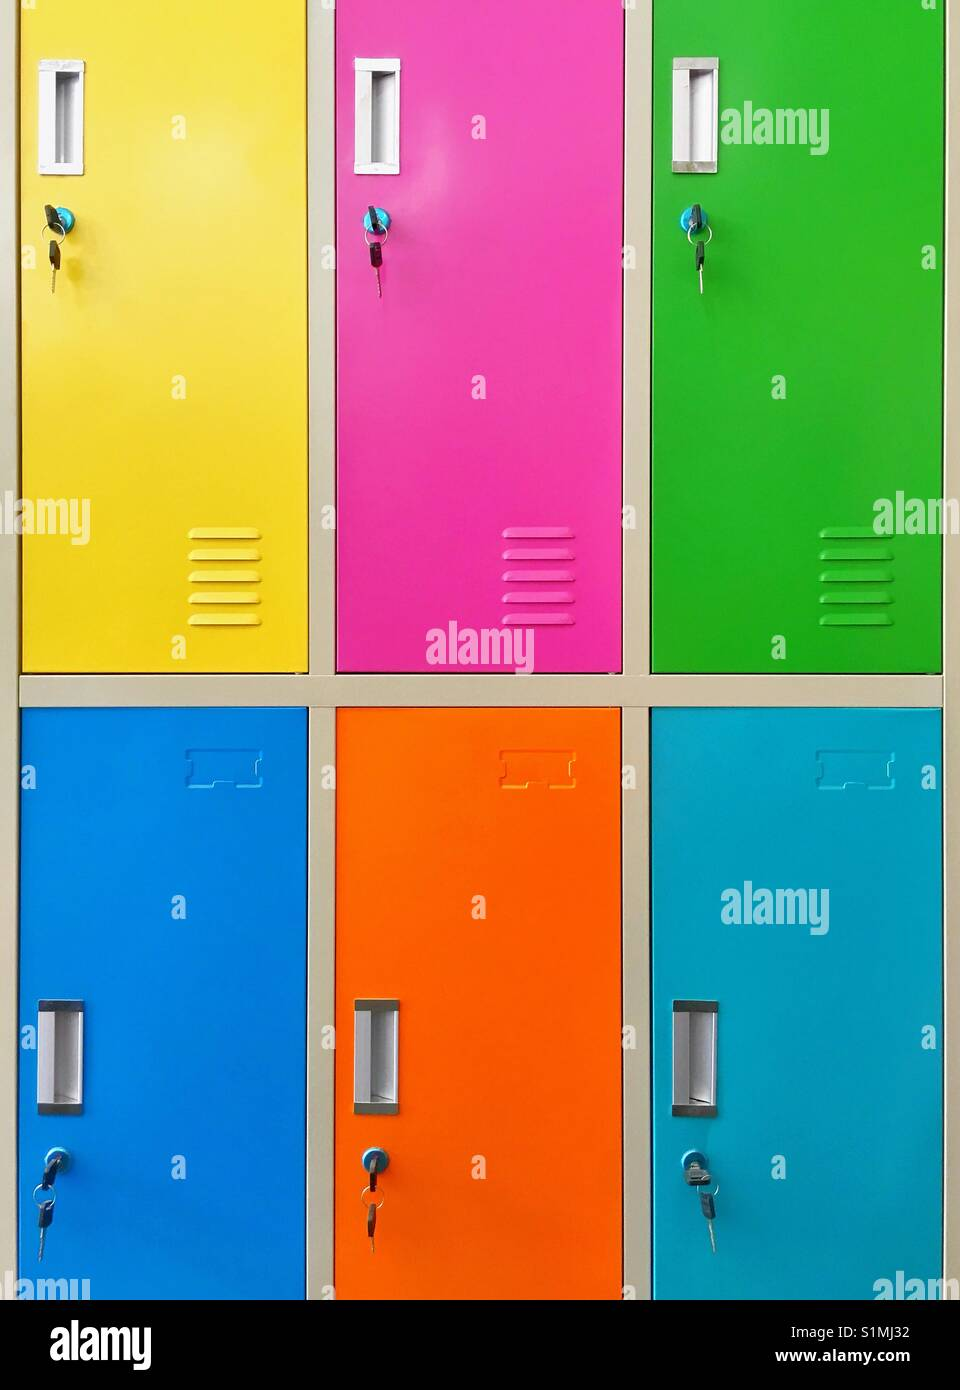 Colourful locker doors - Stock Image  sc 1 st  Alamy & Locker Doors Stock Photos u0026 Locker Doors Stock Images - Alamy